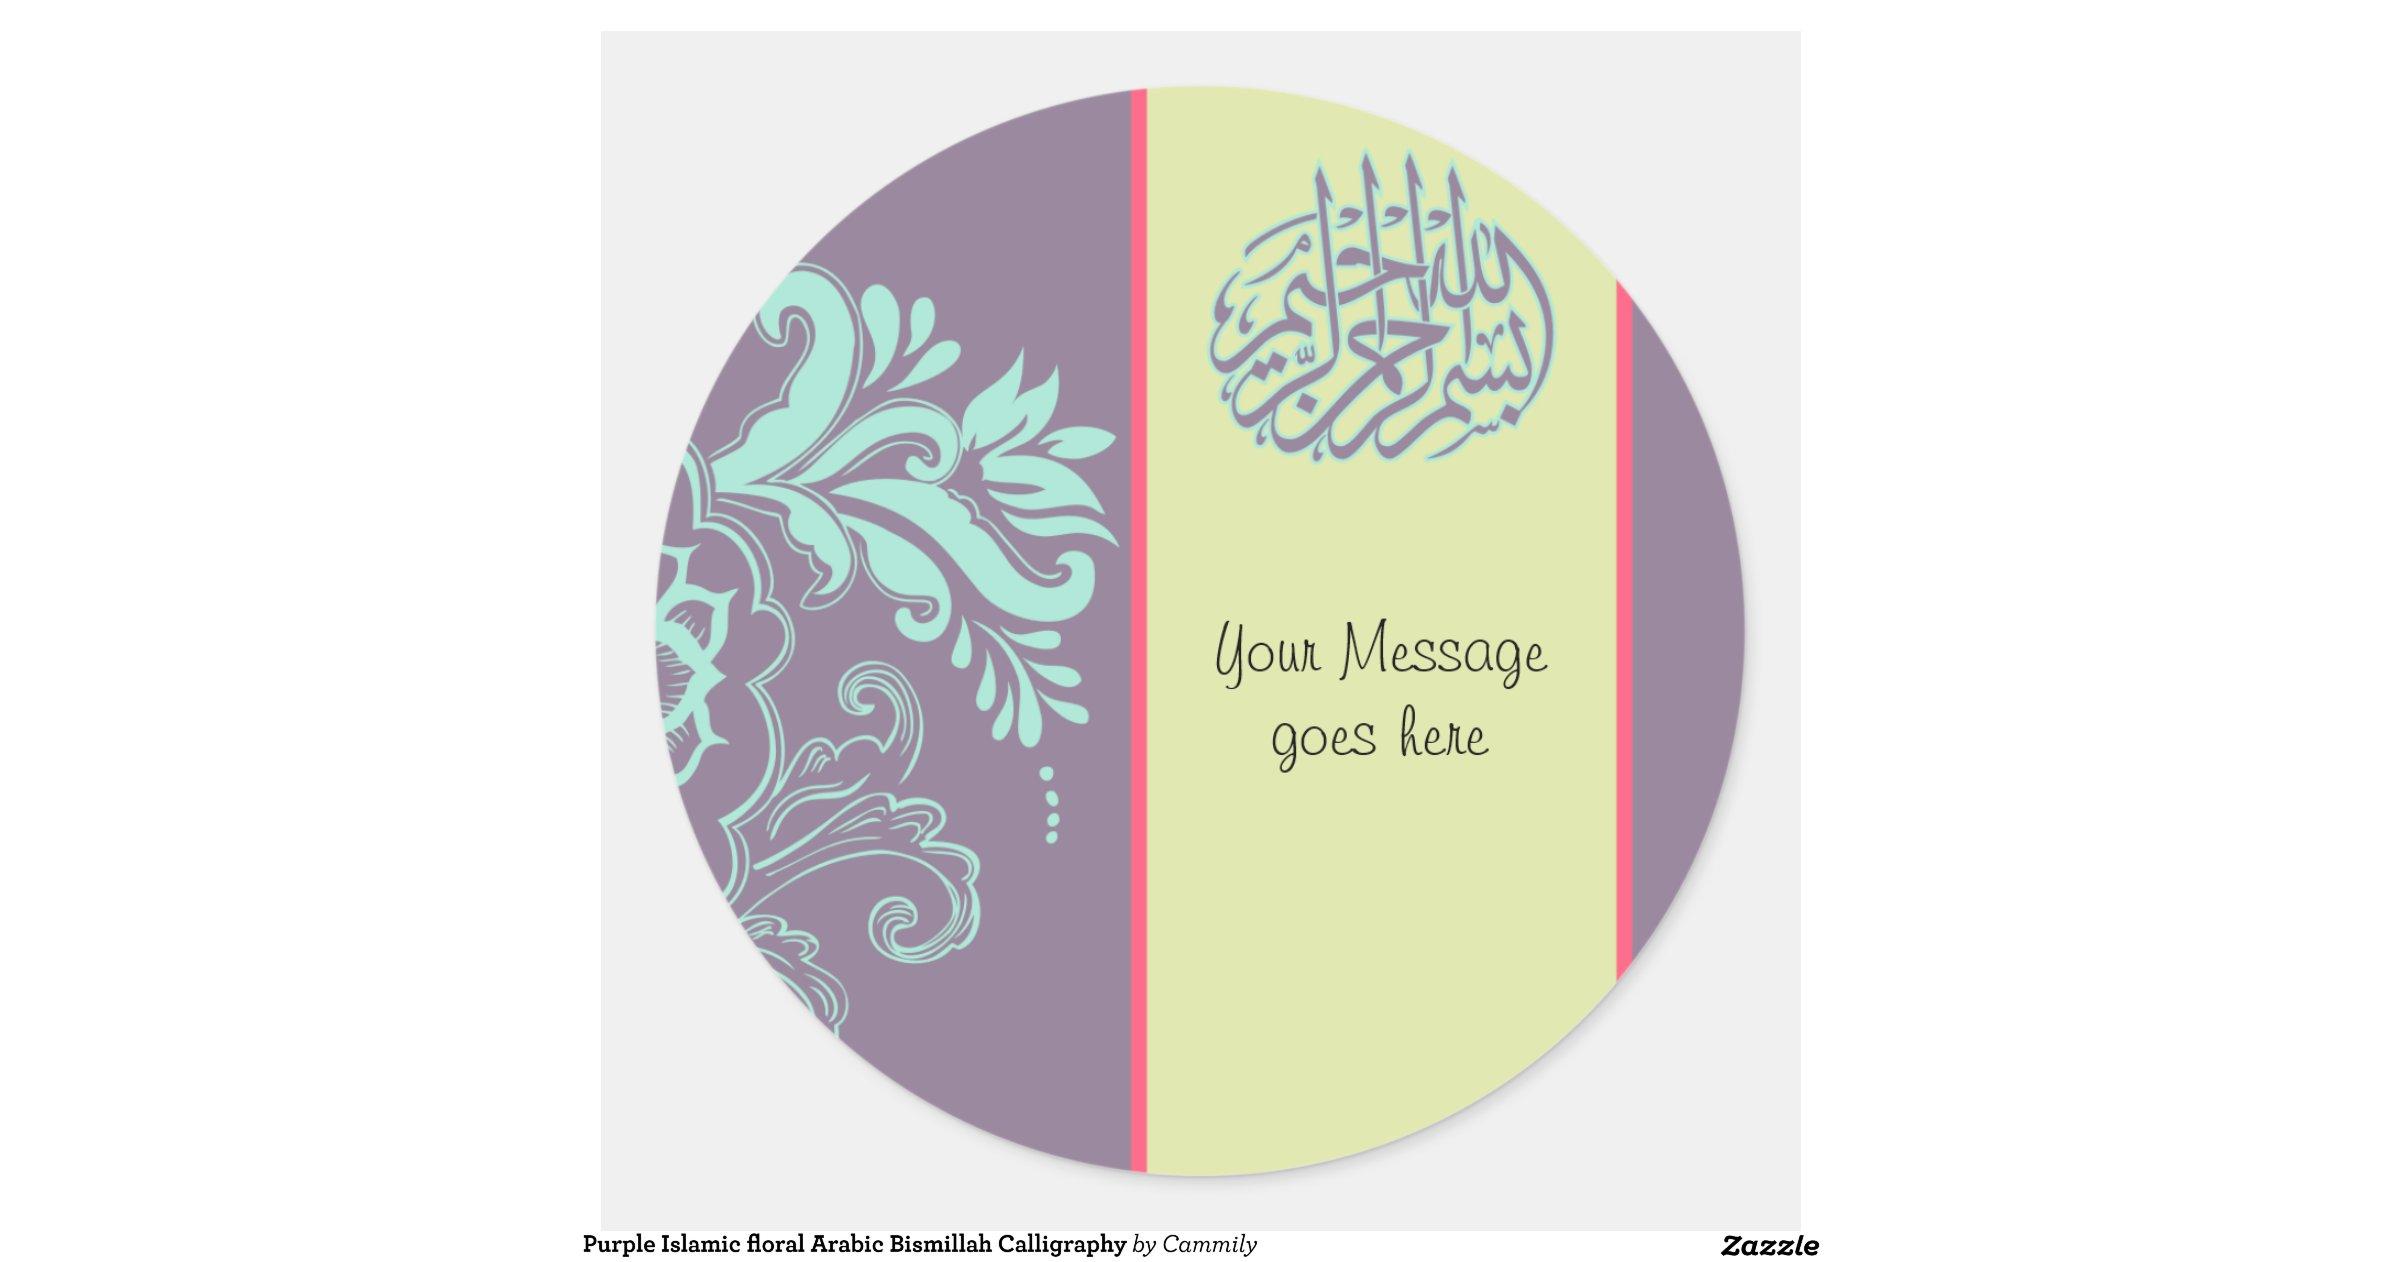 purple islamic floral arabic bismillah calligraphy round sticker zazzle. Black Bedroom Furniture Sets. Home Design Ideas